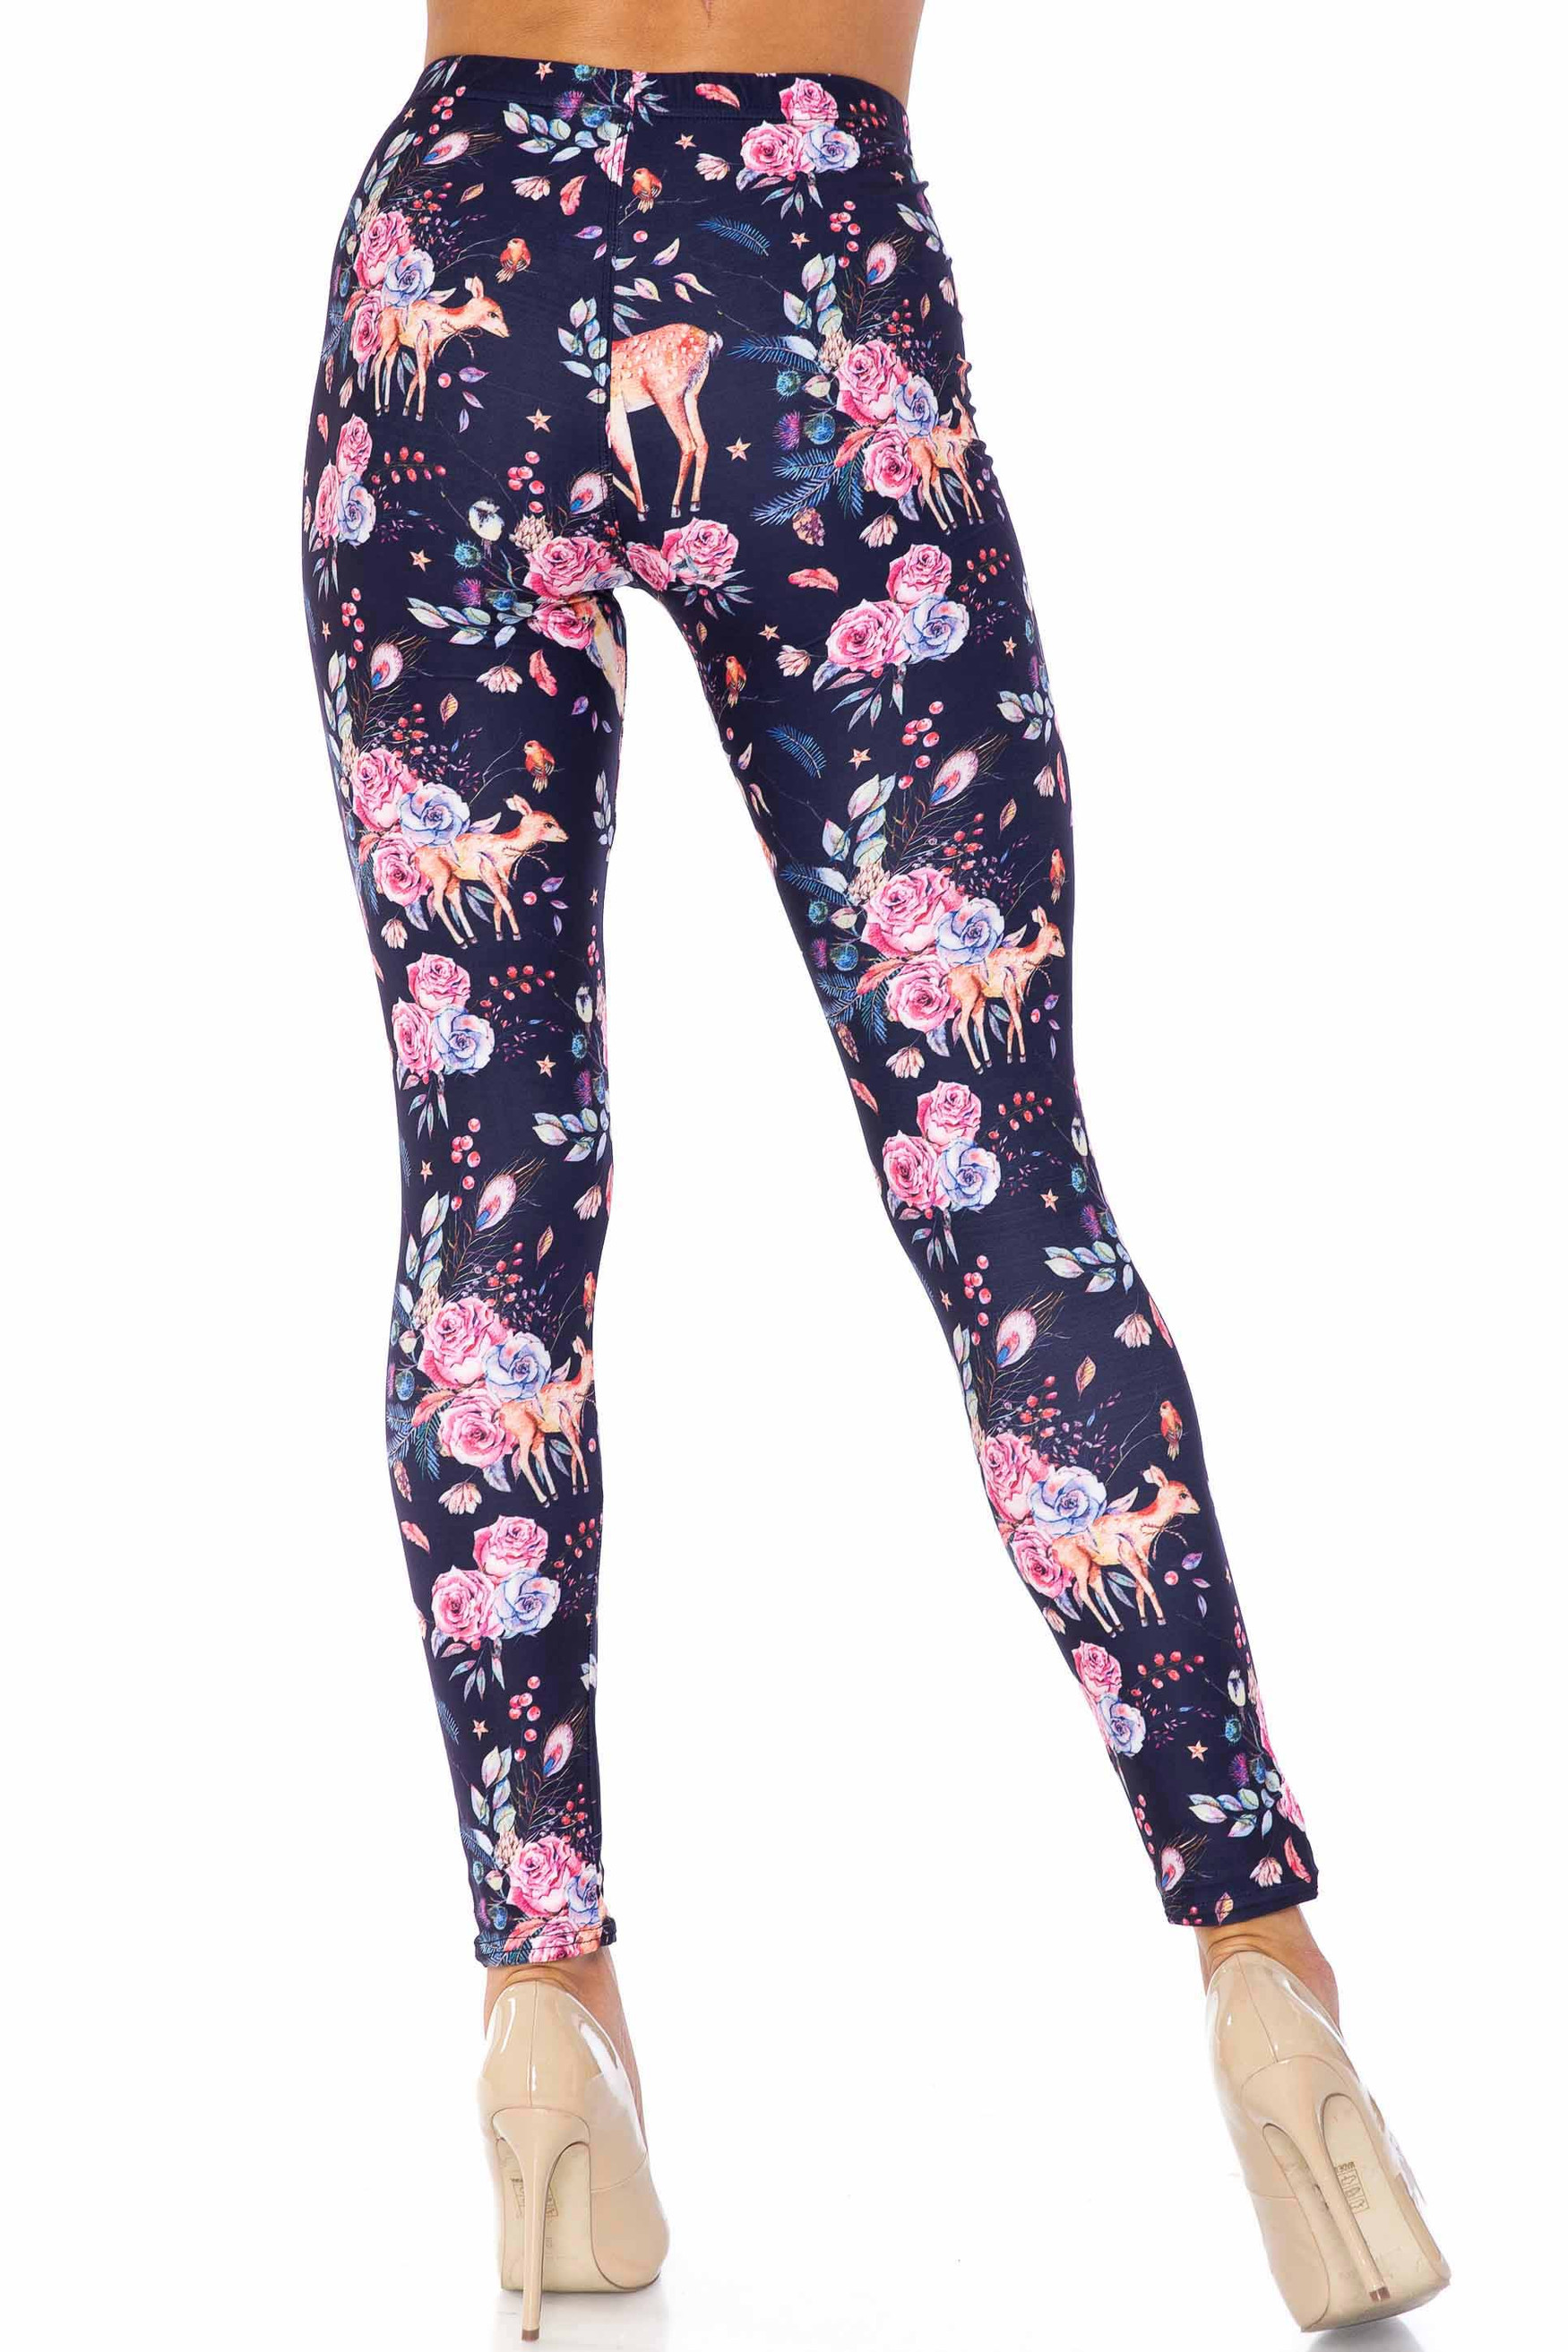 Creamy Soft Woodland Floral Fawn Extra Plus Size Leggings - 3X-5X - USA Fashion™